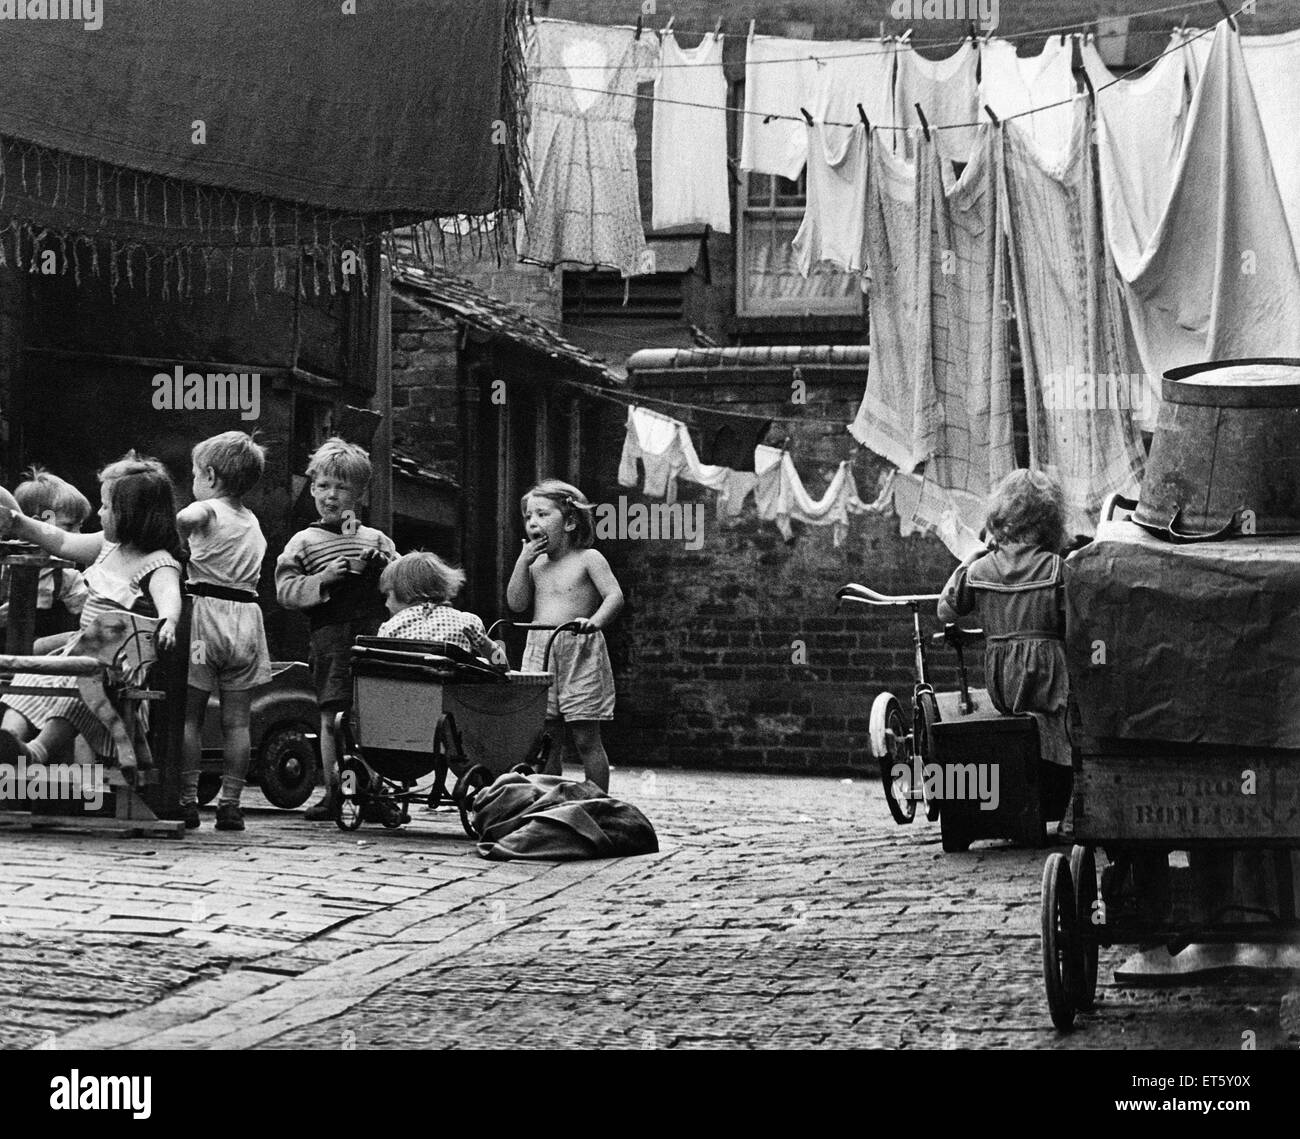 Slum Housing 1950s Stock Photos & Slum Housing 1950s Stock